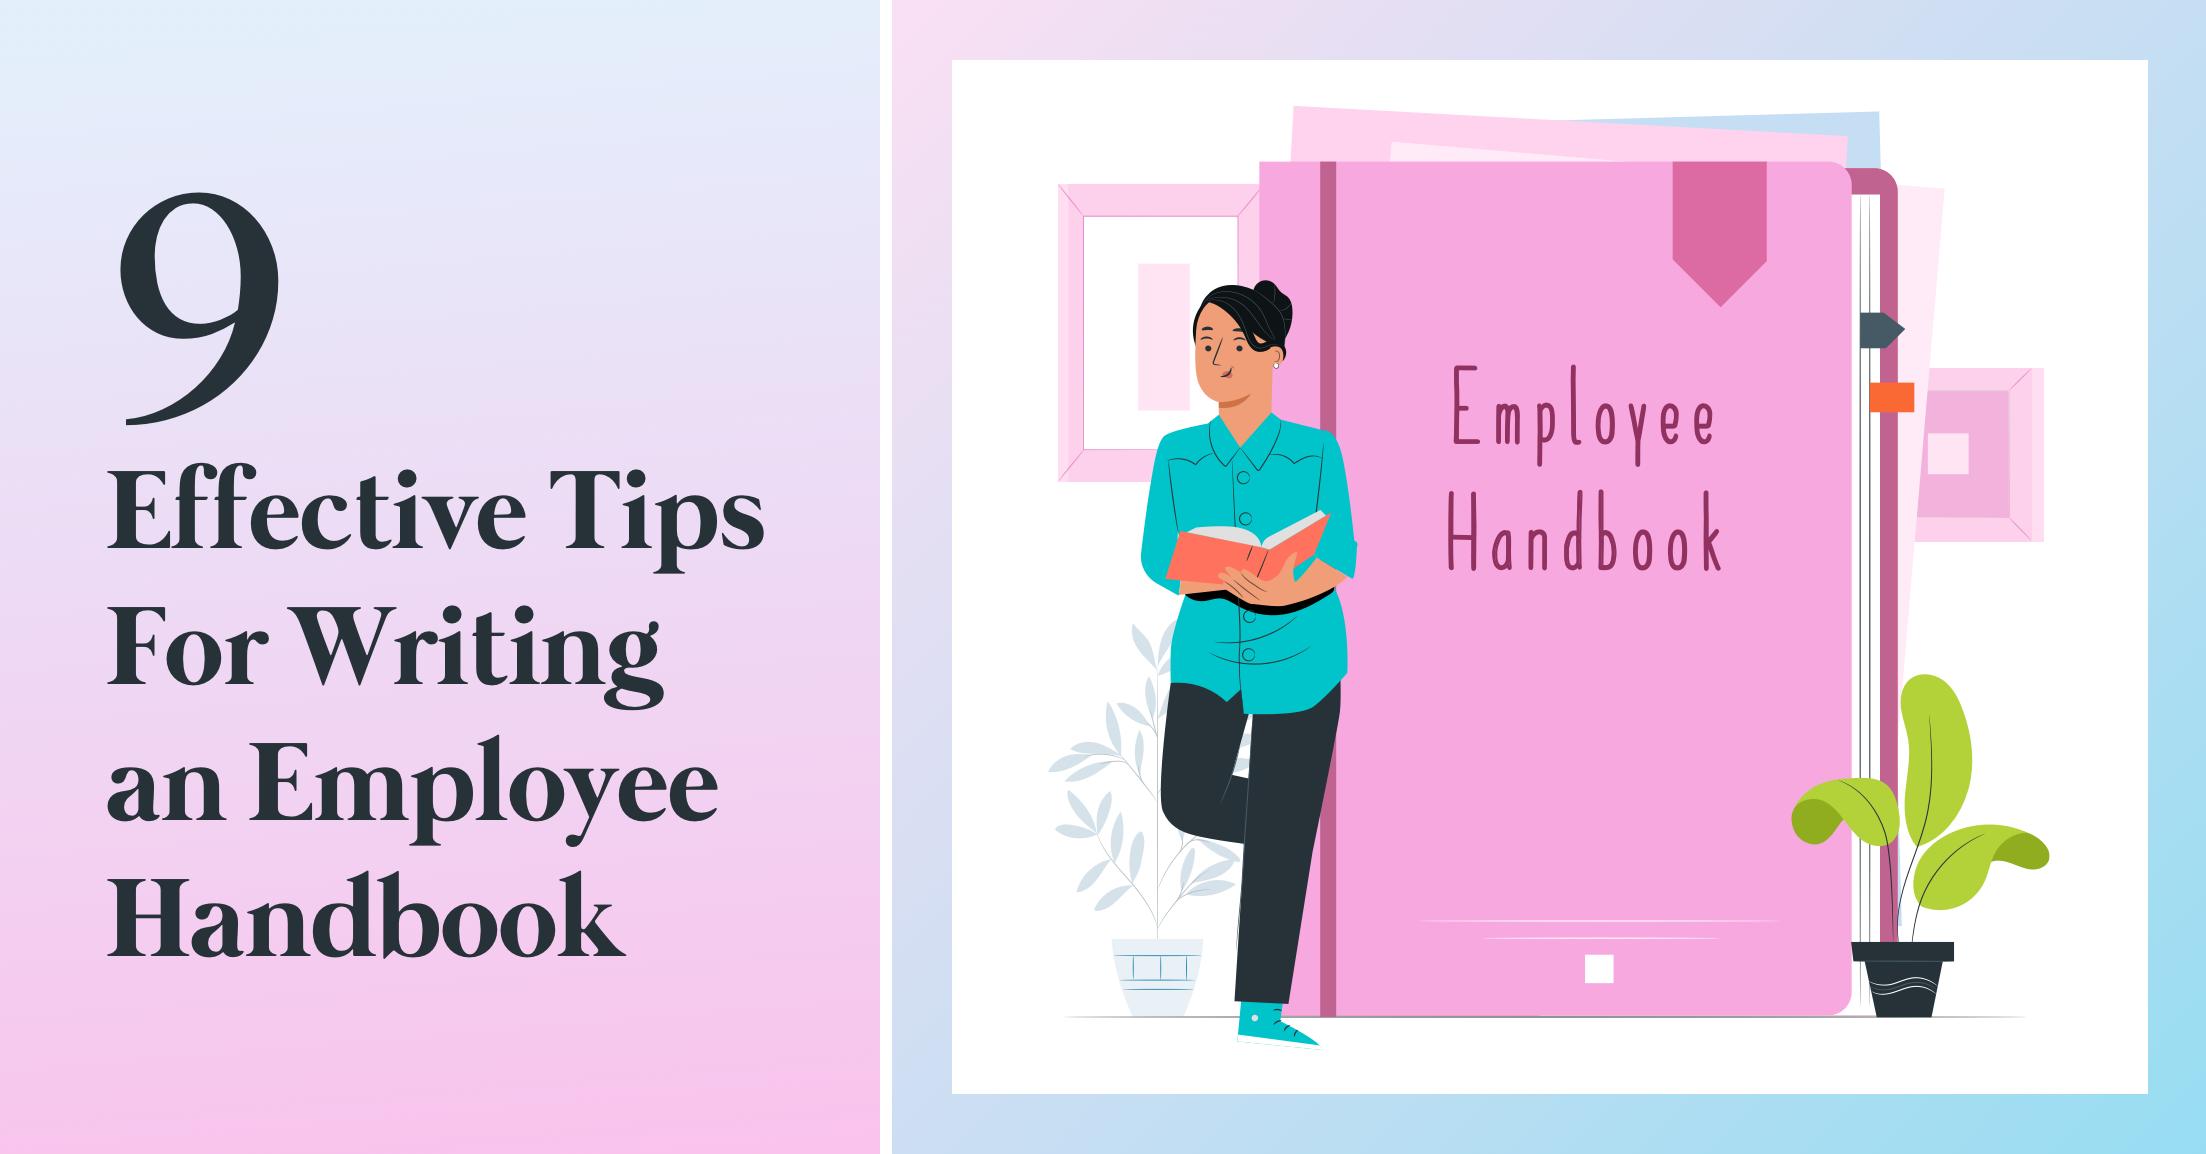 Nine Tips for Writing an Employee Handbook